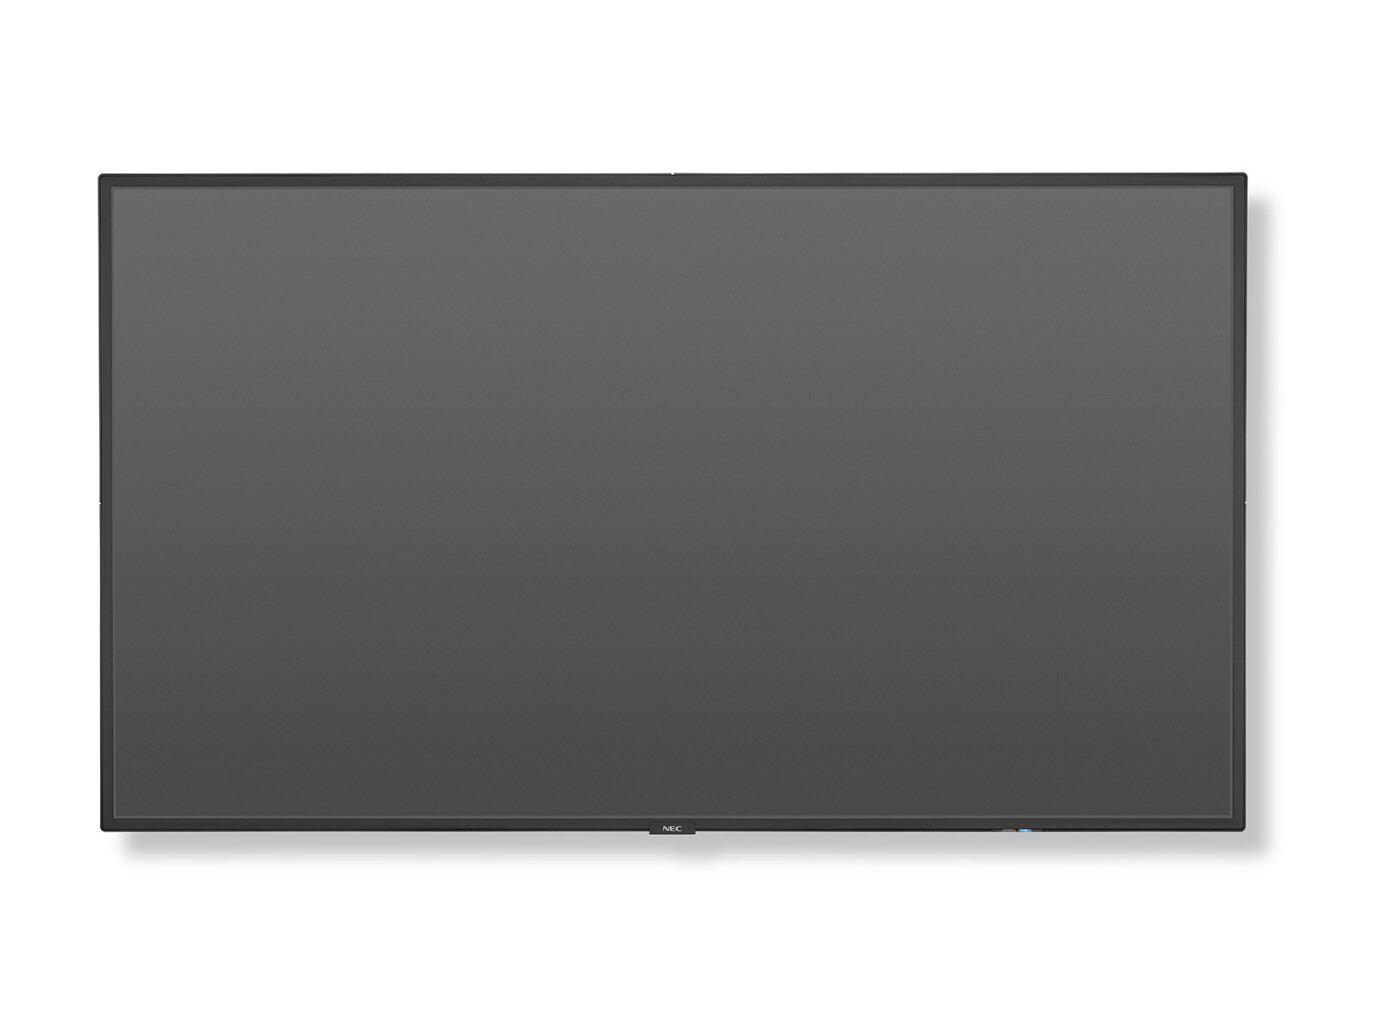 "NEC MultiSync V484-RPi 48"" Display mit Full-HD Auflösung"